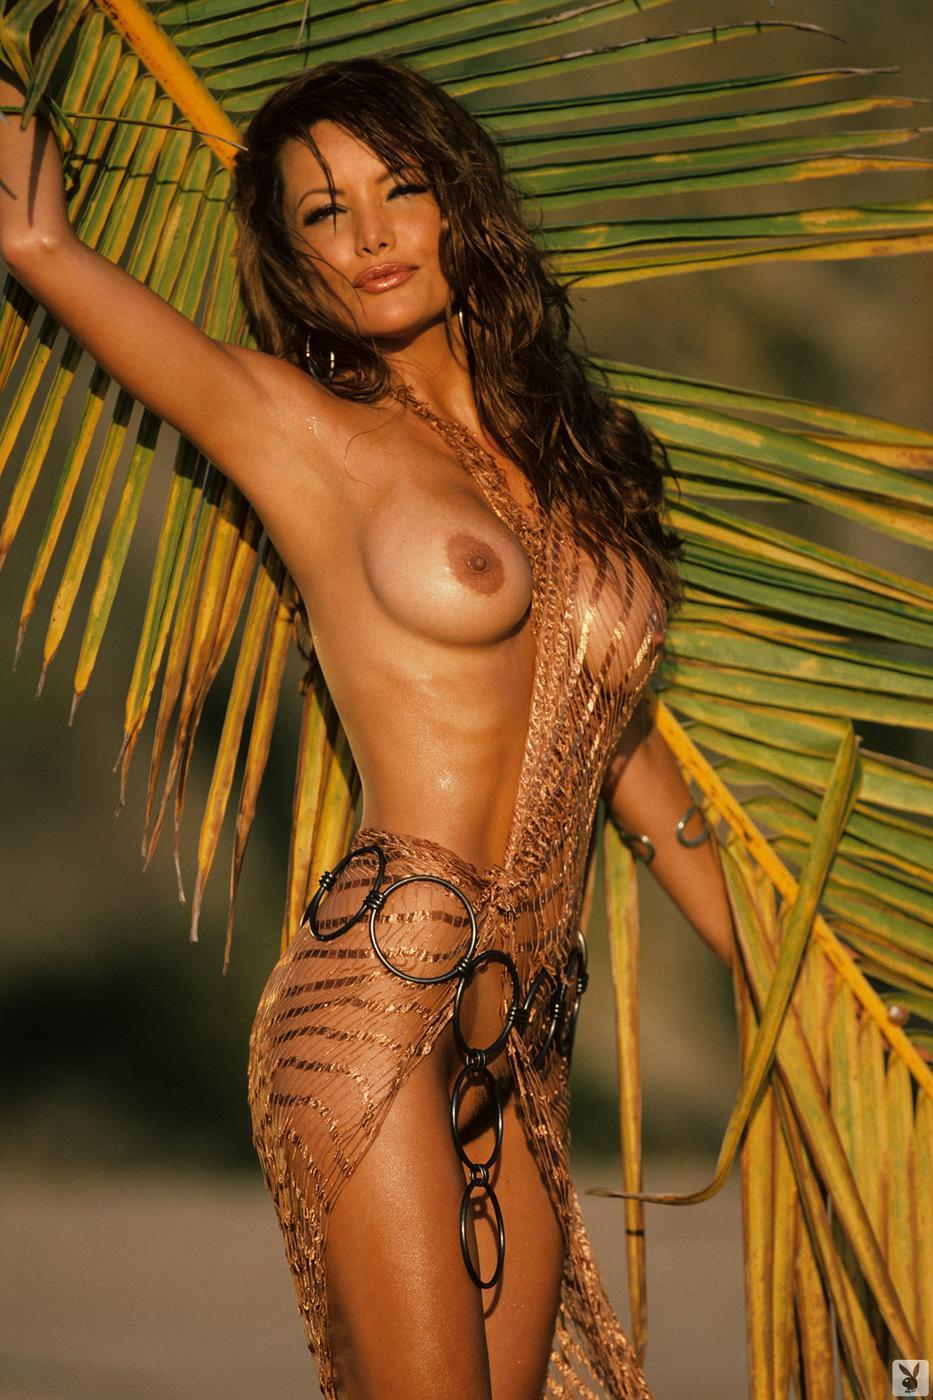 Brandi Brandt - breasts